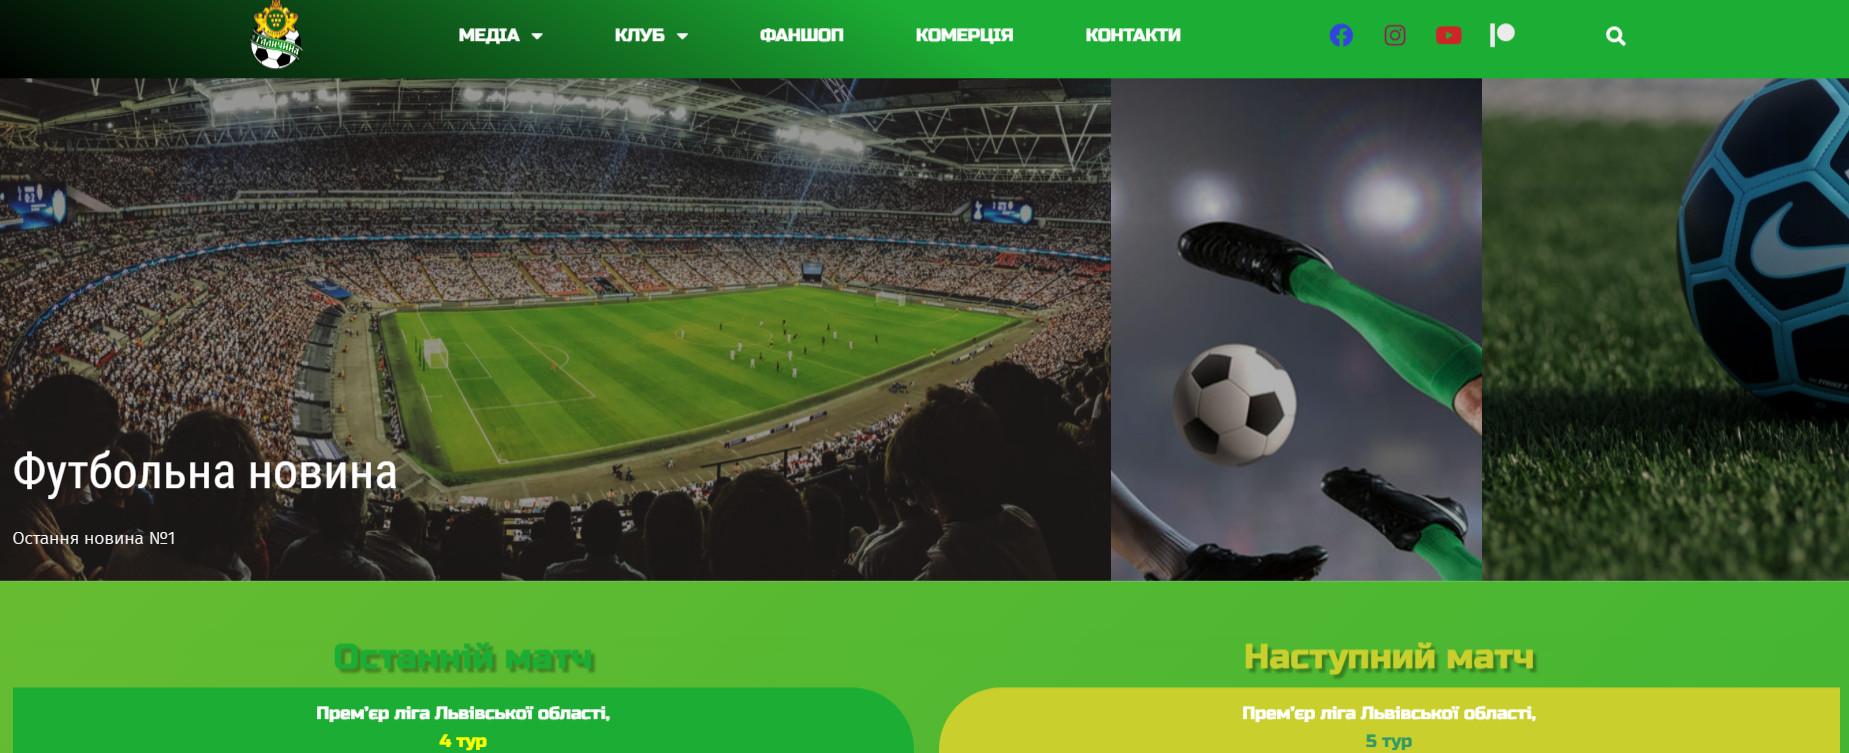 Корпоративный сайт футбольного клуба ФК